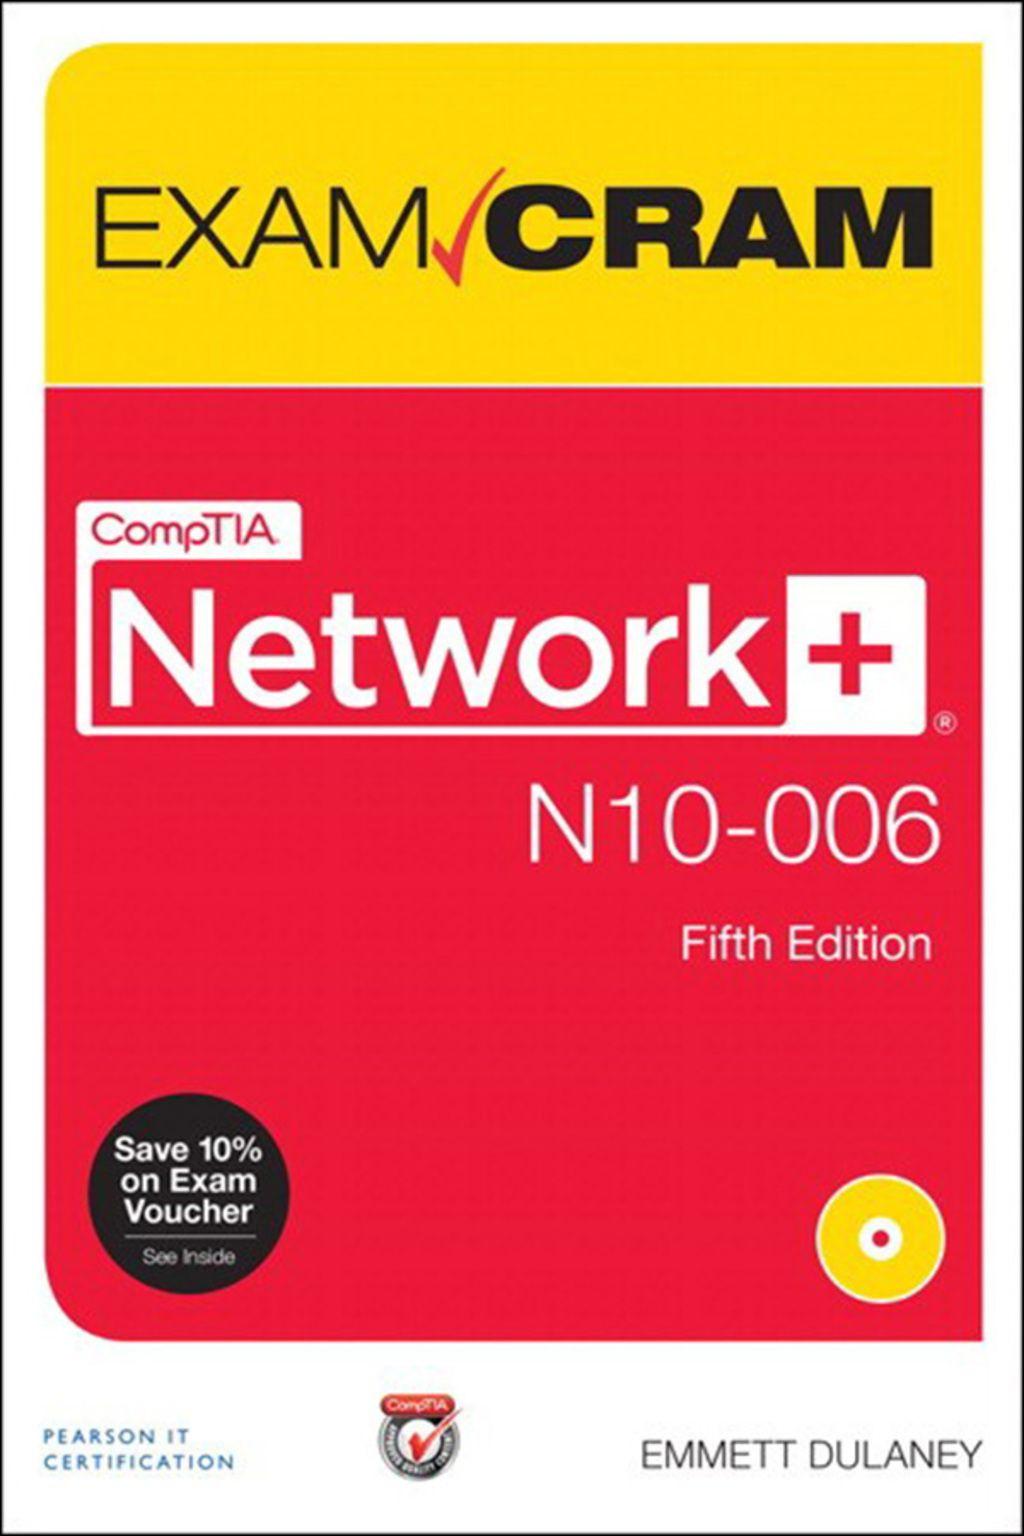 Comptia Network N10 006 Exam Cram 5th Edition Ebook In 2021 Exam Cram Exam Free Books Online